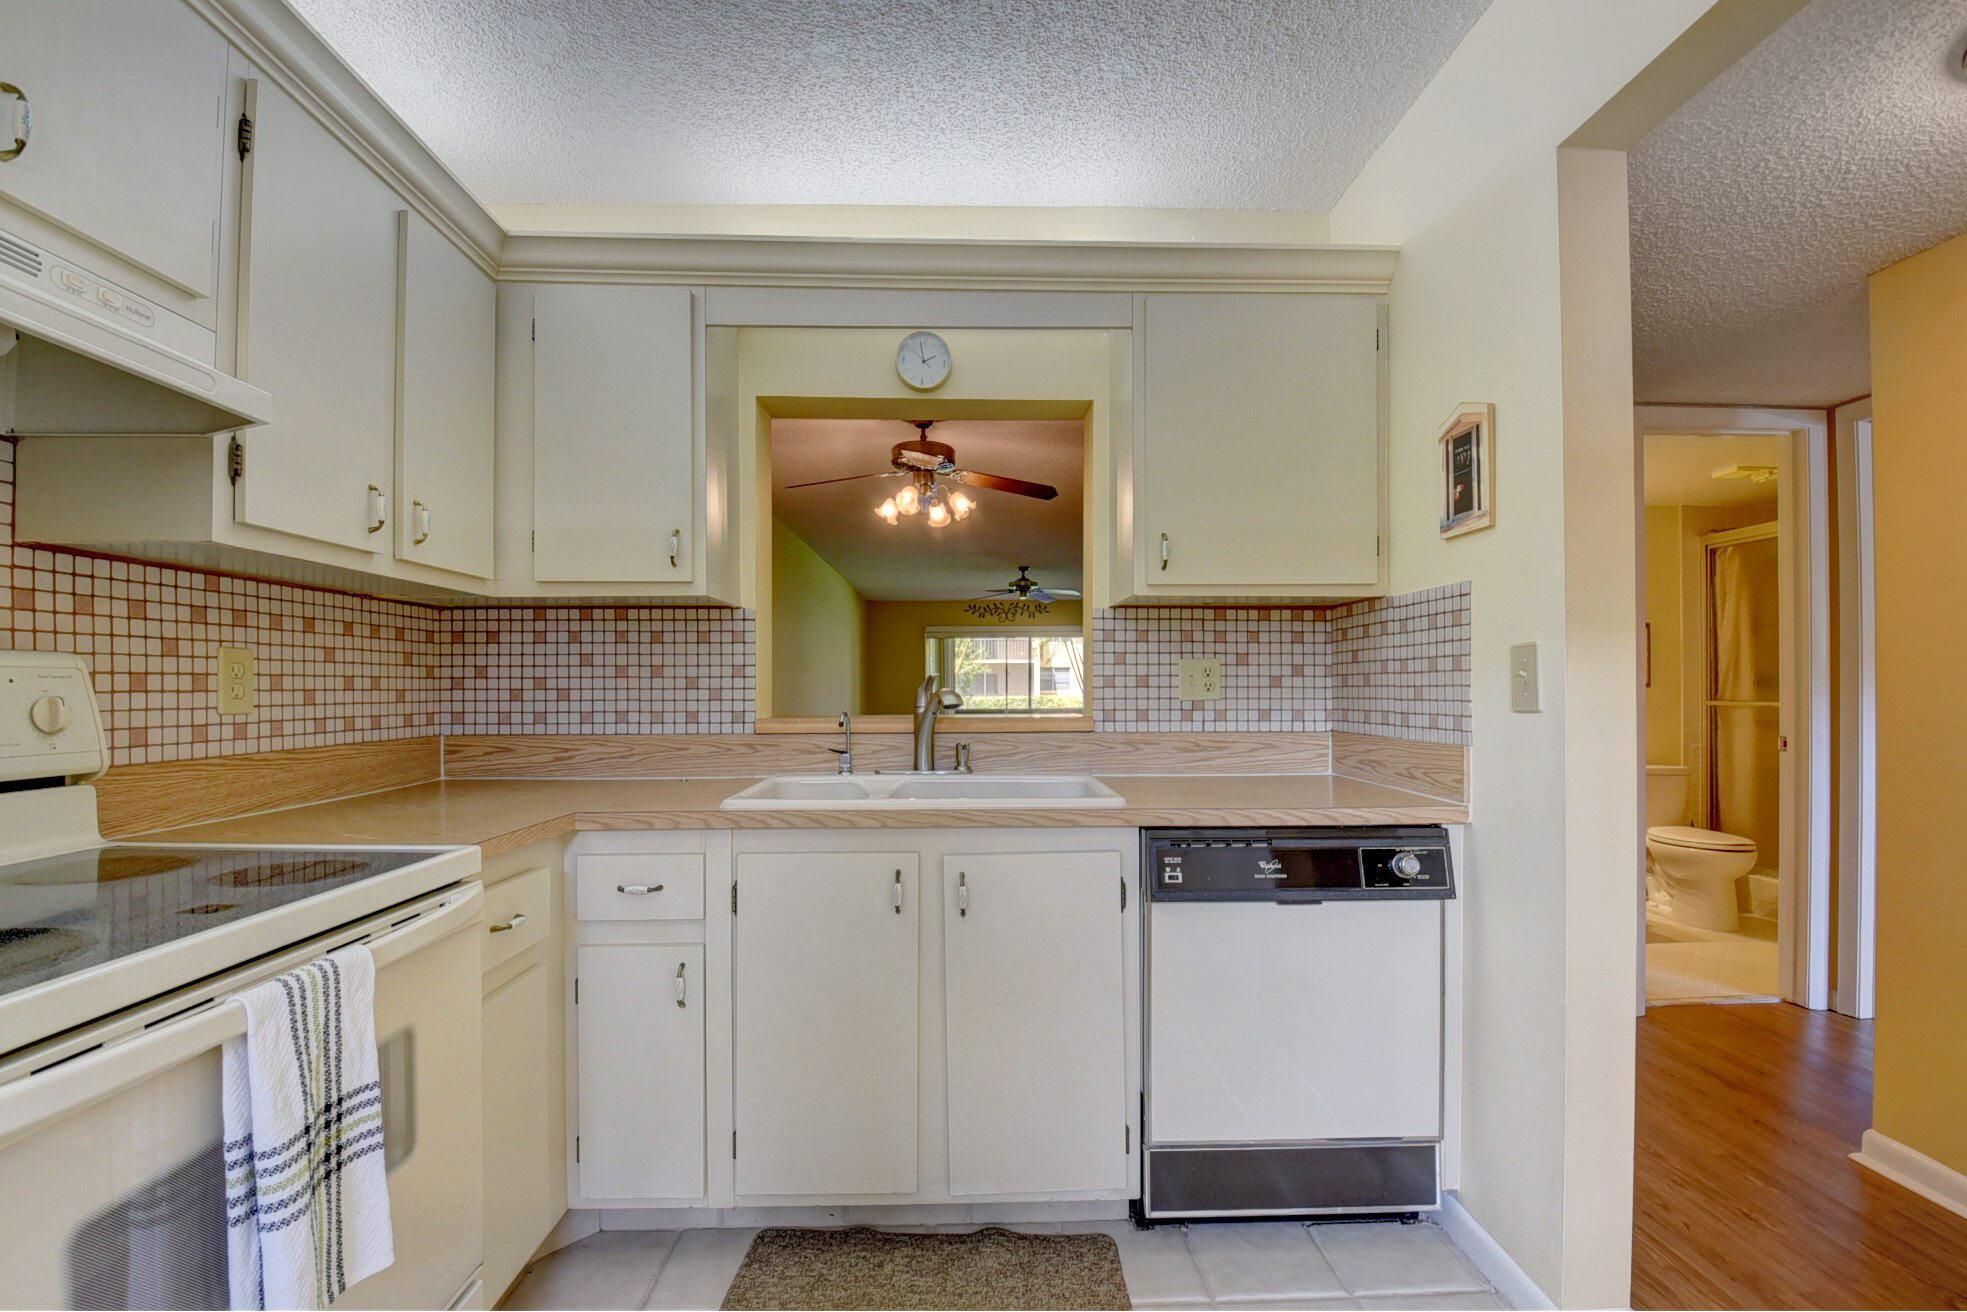 2955 SW 22 Avenue #106 For Sale 10751307, FL